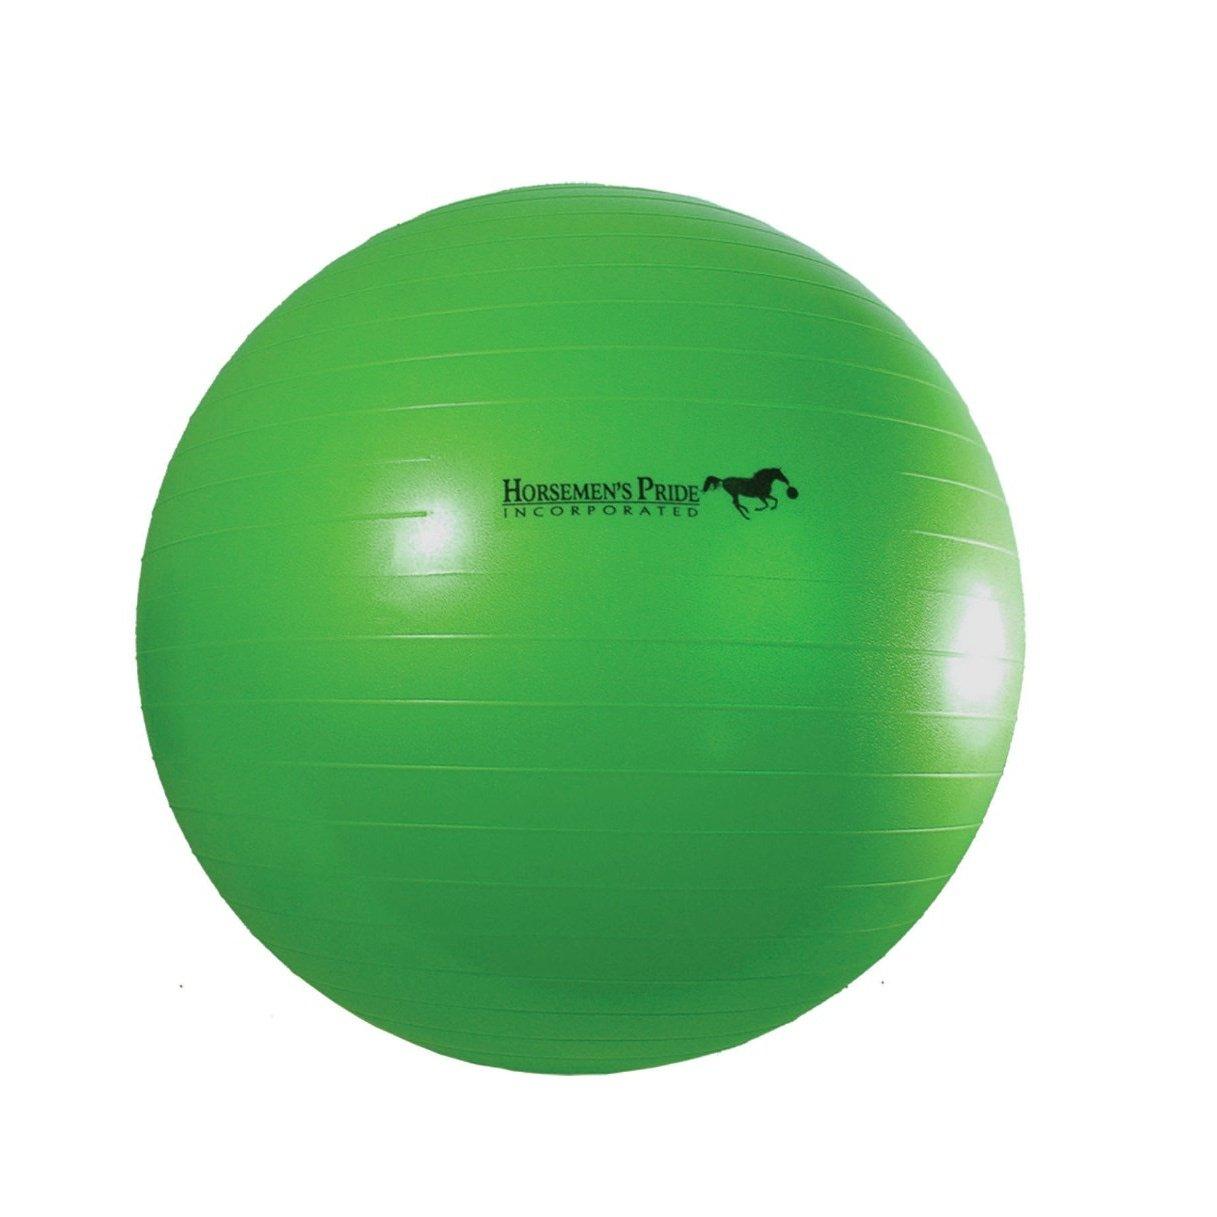 Horsemen Pride Jolly Mega Ball (40 inches) (Green)